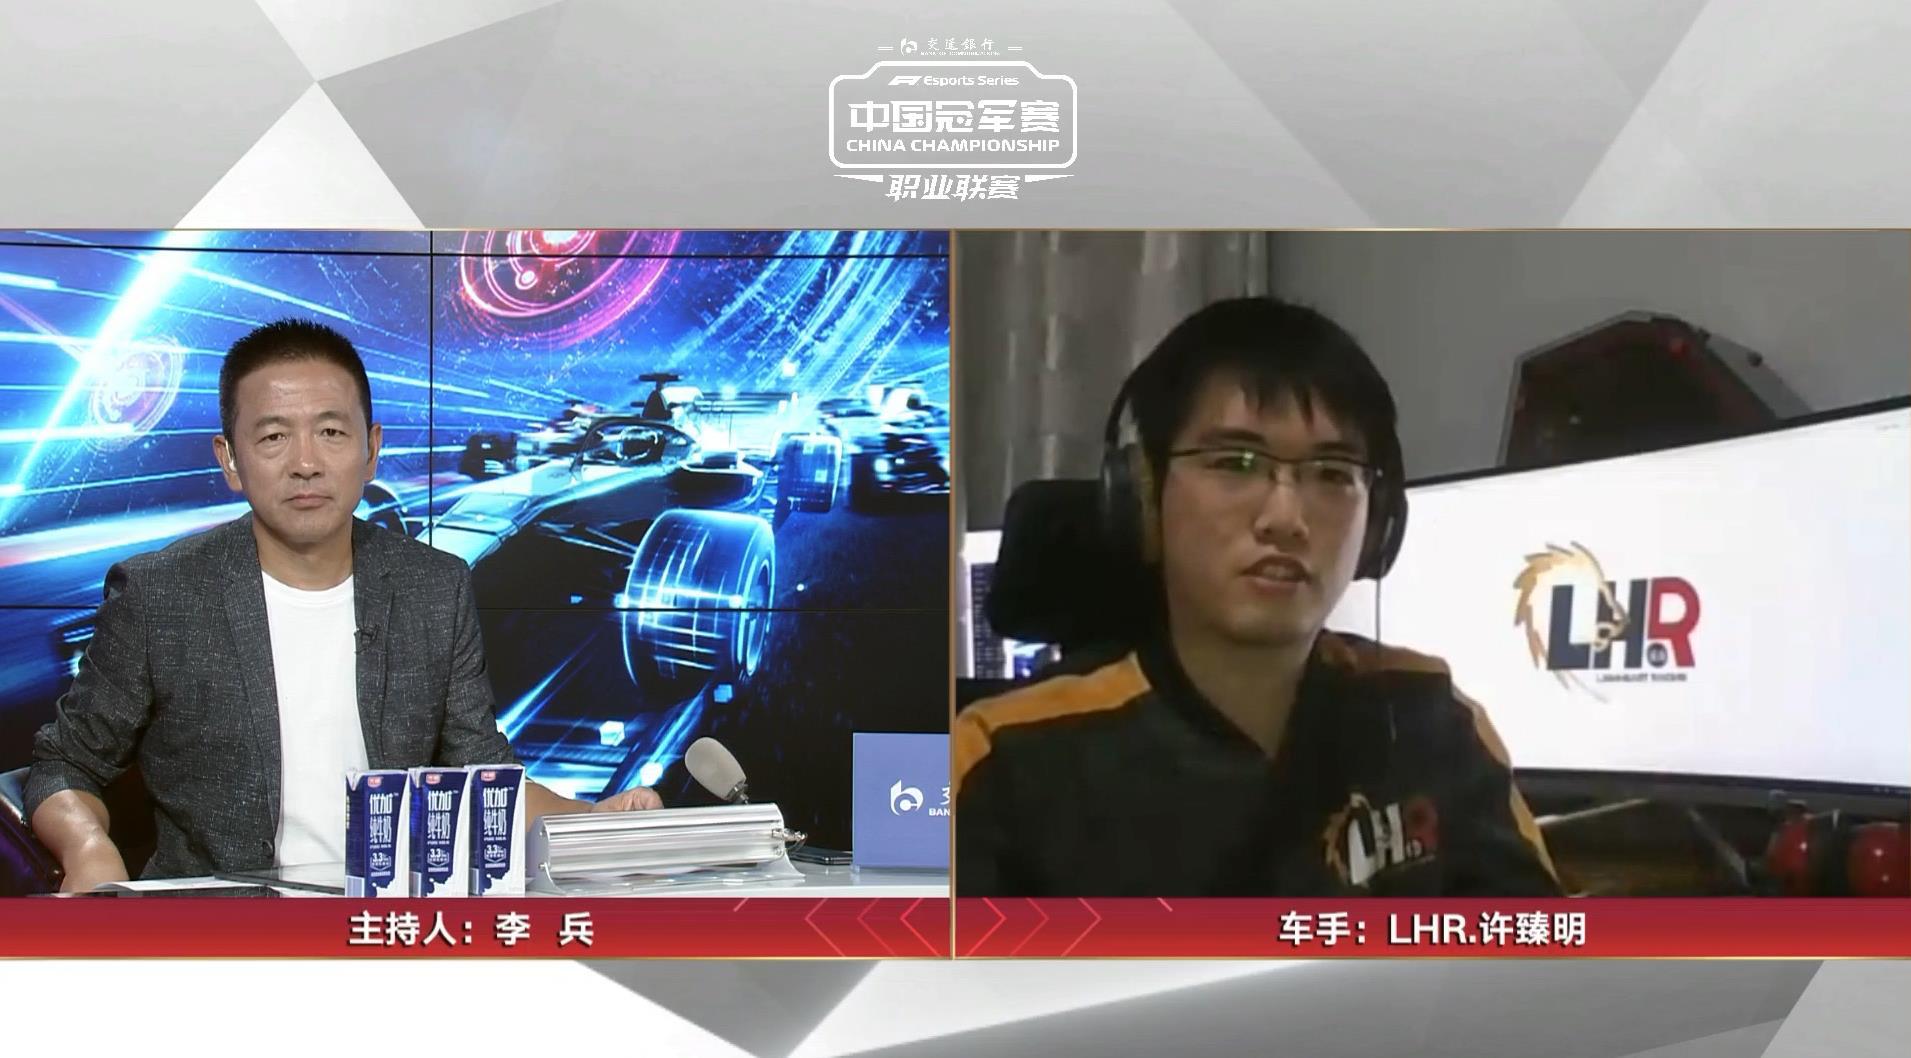 F1电竞中国冠军赛:电竞赛车也有车队战术?